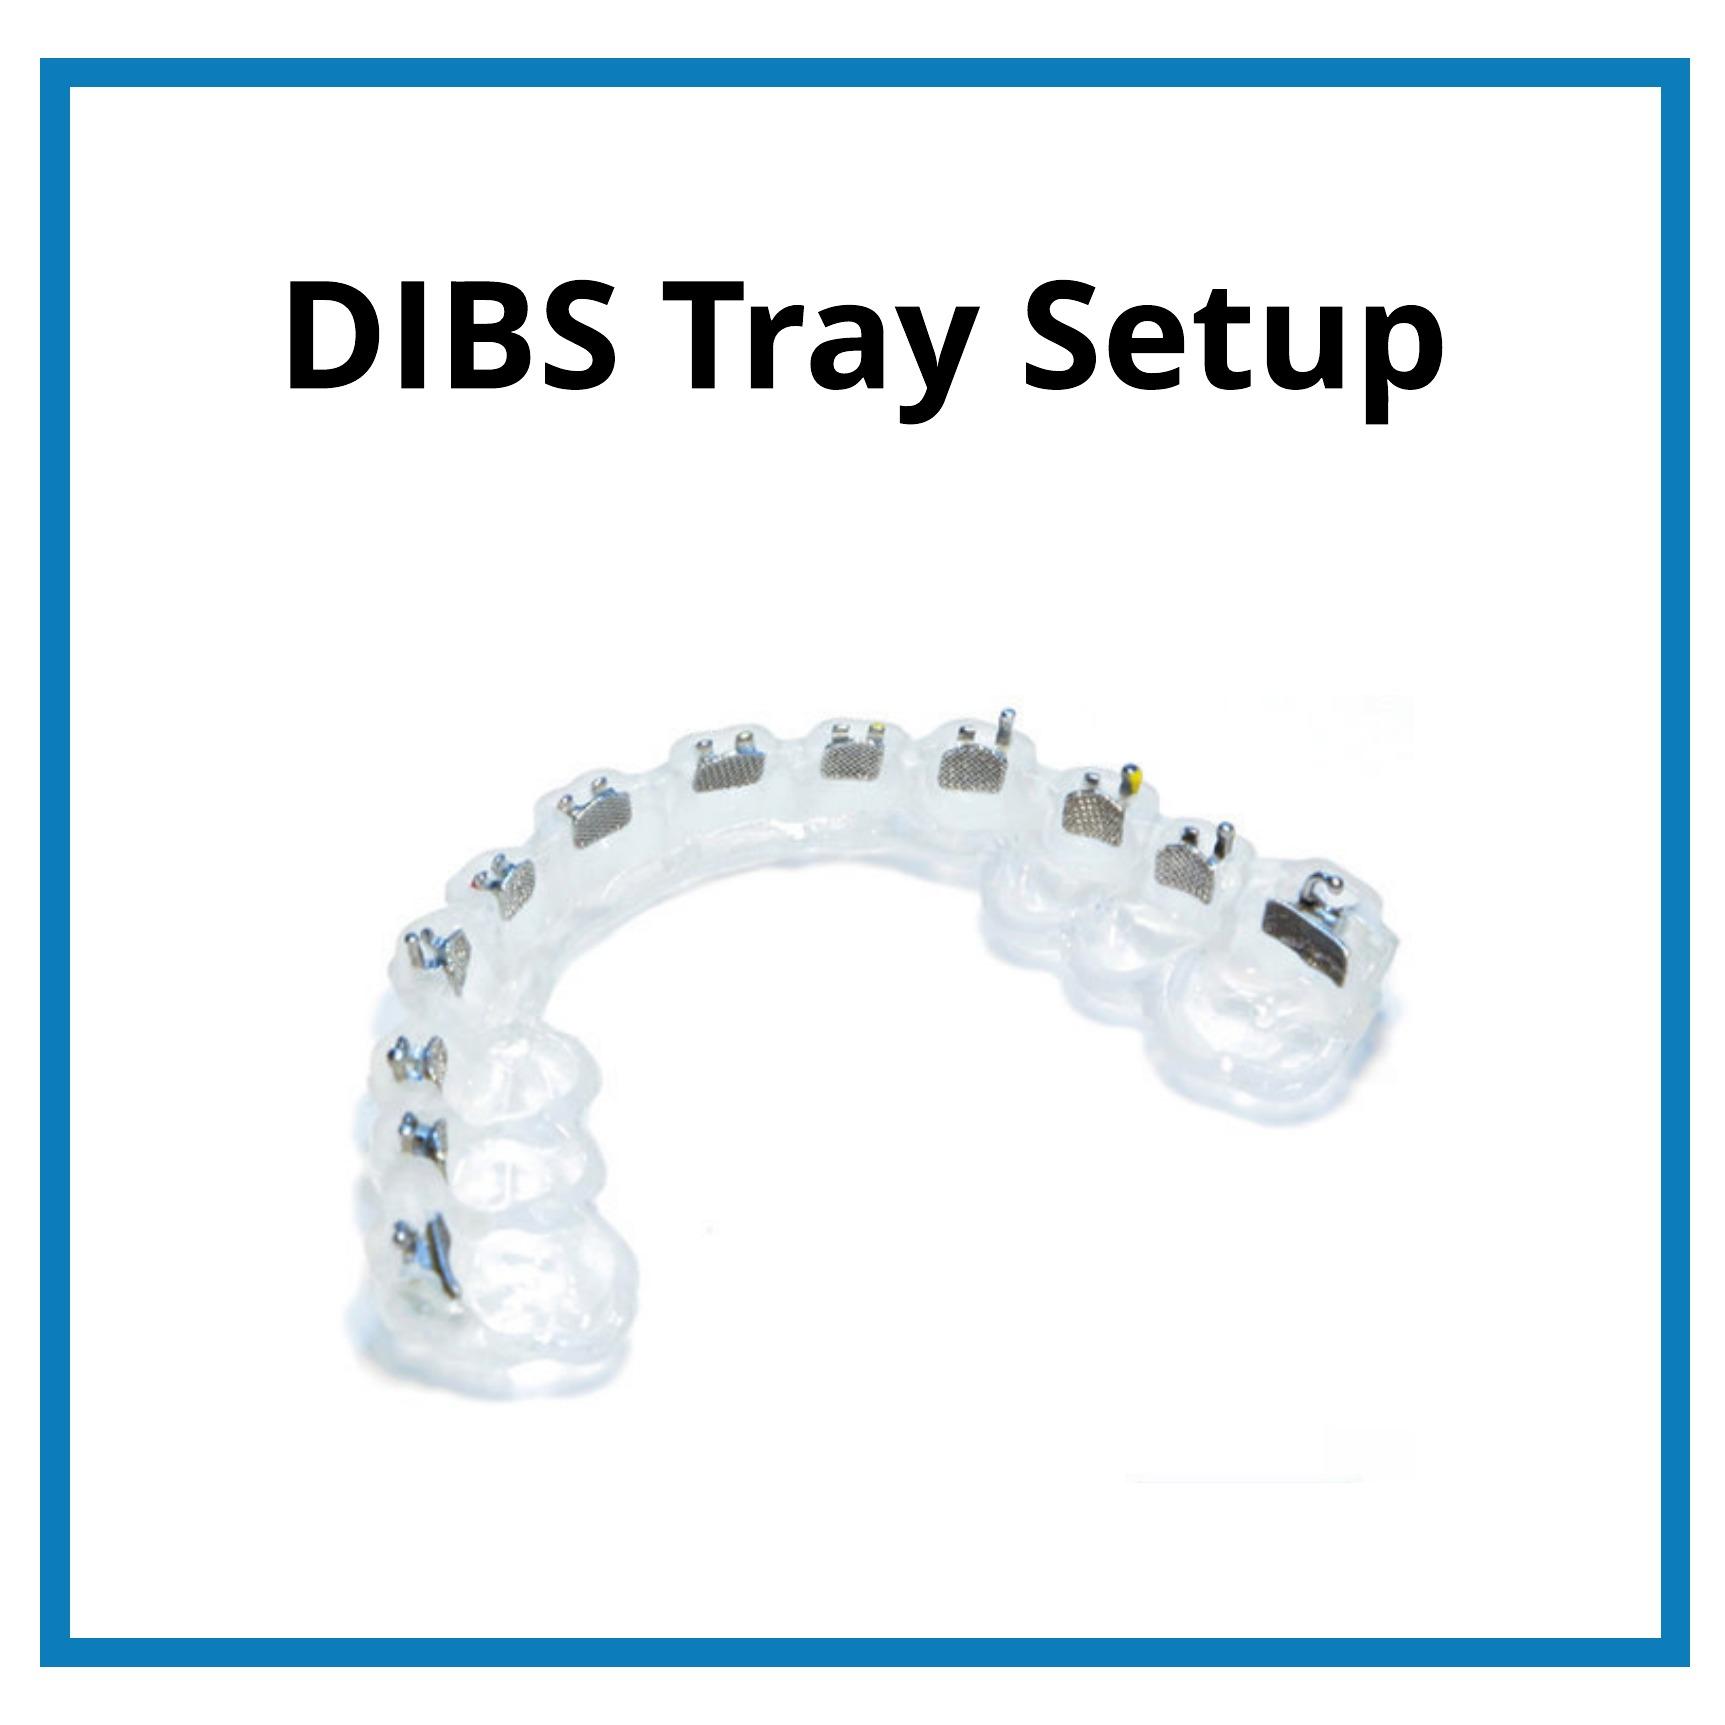 DIBS Tray Setup.jpeg